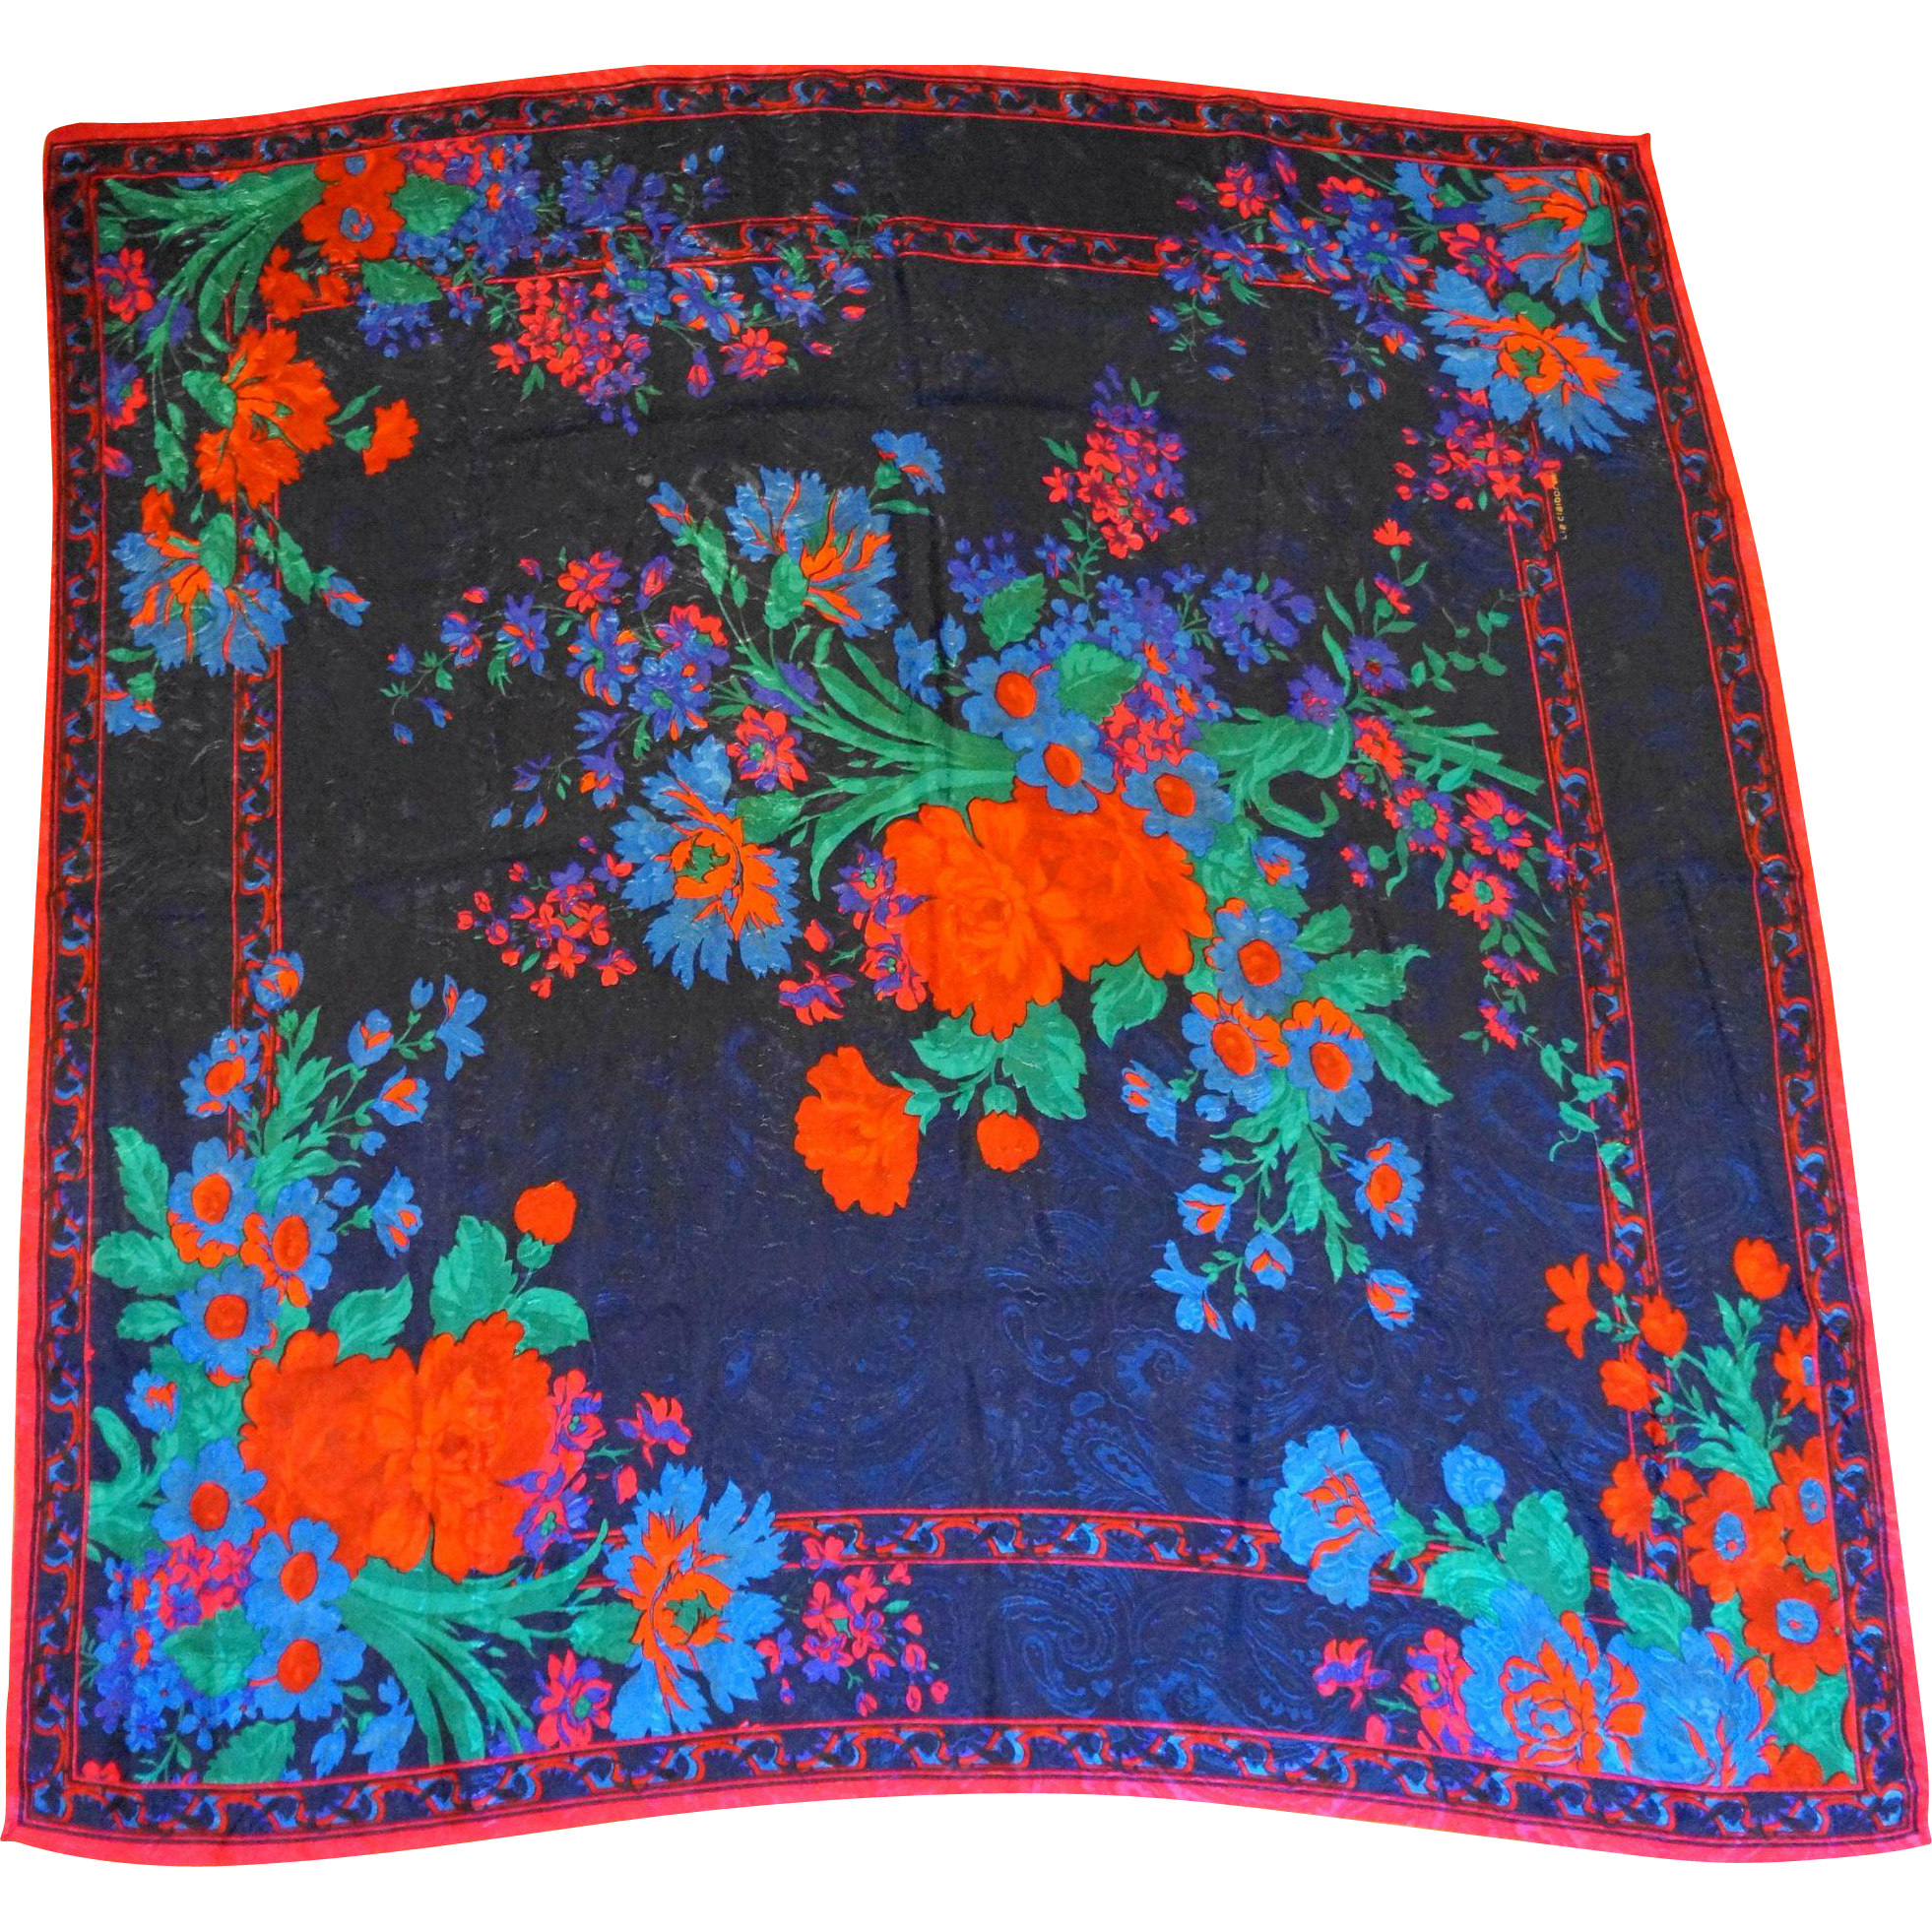 Liz Claiborne Floral Jacquard Polyester Scarf Dark Jewel Tones 33 IN Square